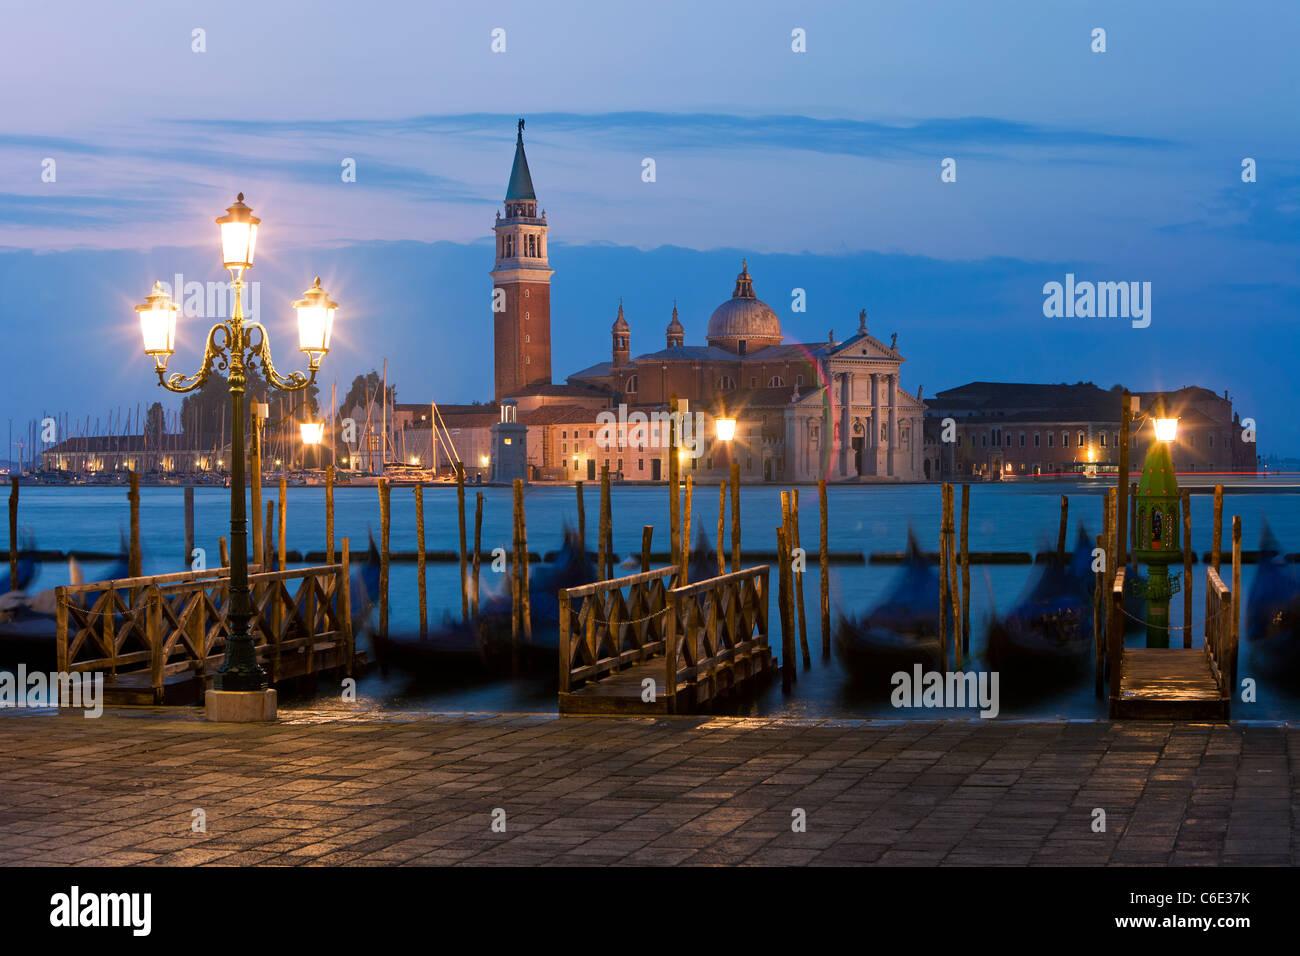 Quay at St Mark's Square with Gondolas and the view to San Giorgio Maggiore Island, Venice, Italy, Europe Stock Photo